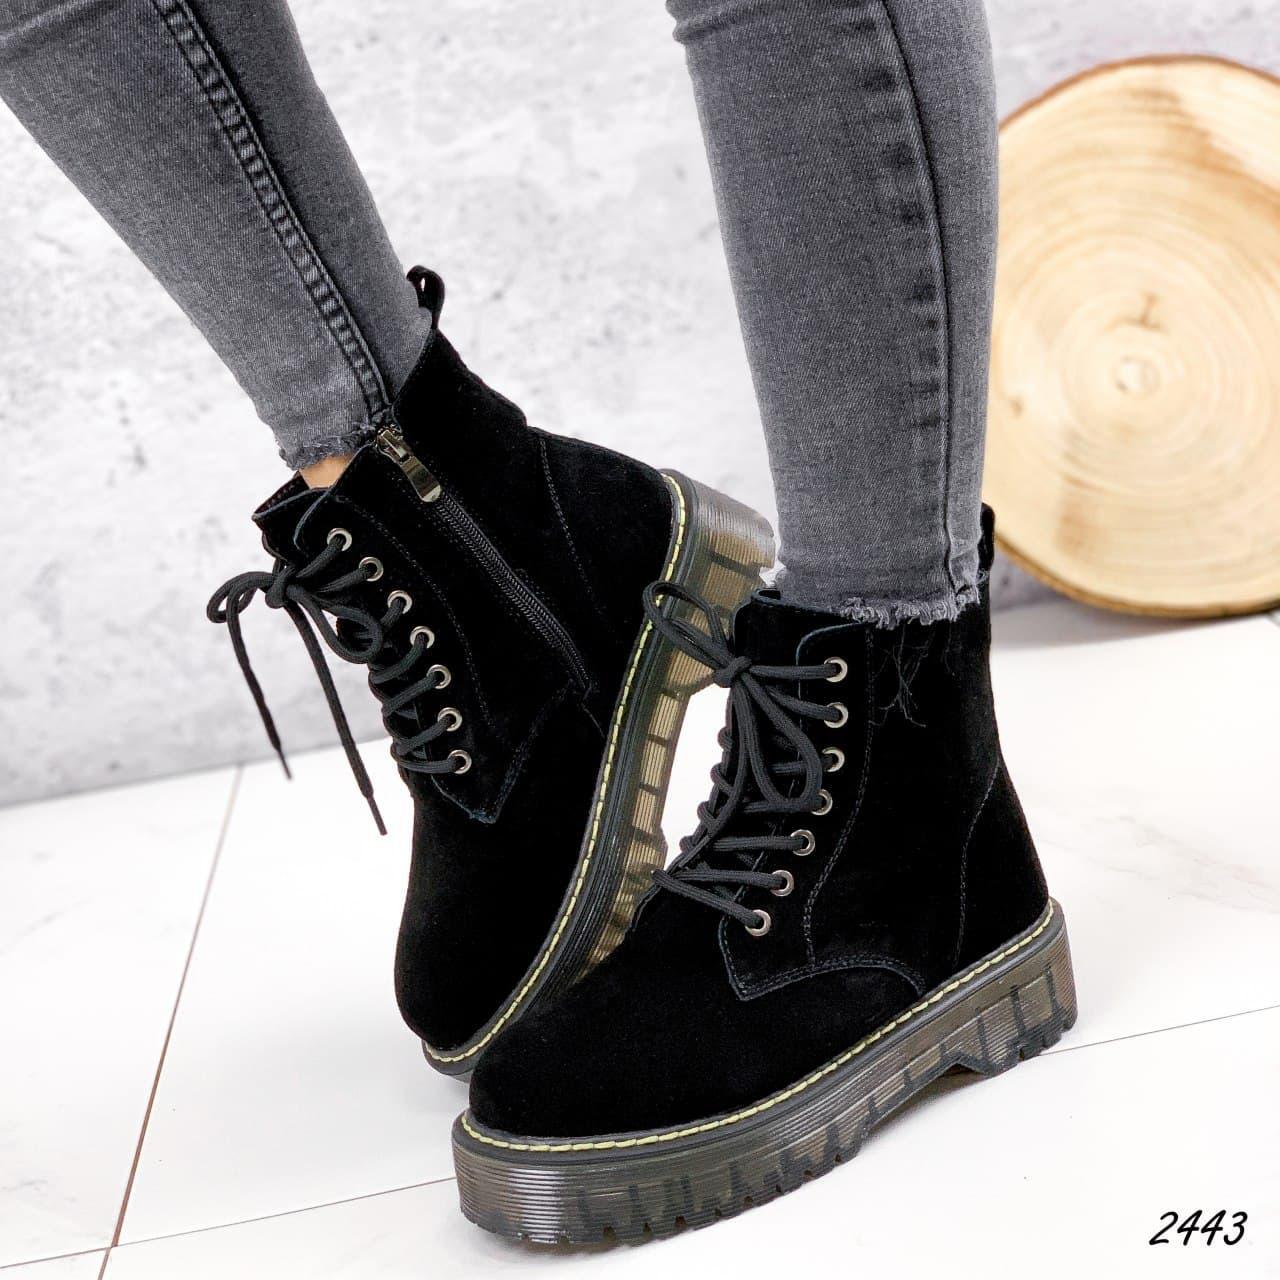 Ботинки женские черные, зимние из НАТУРАЛЬНОЙ ЗАМШИ. Черевики жіночі теплі чорні на платформі